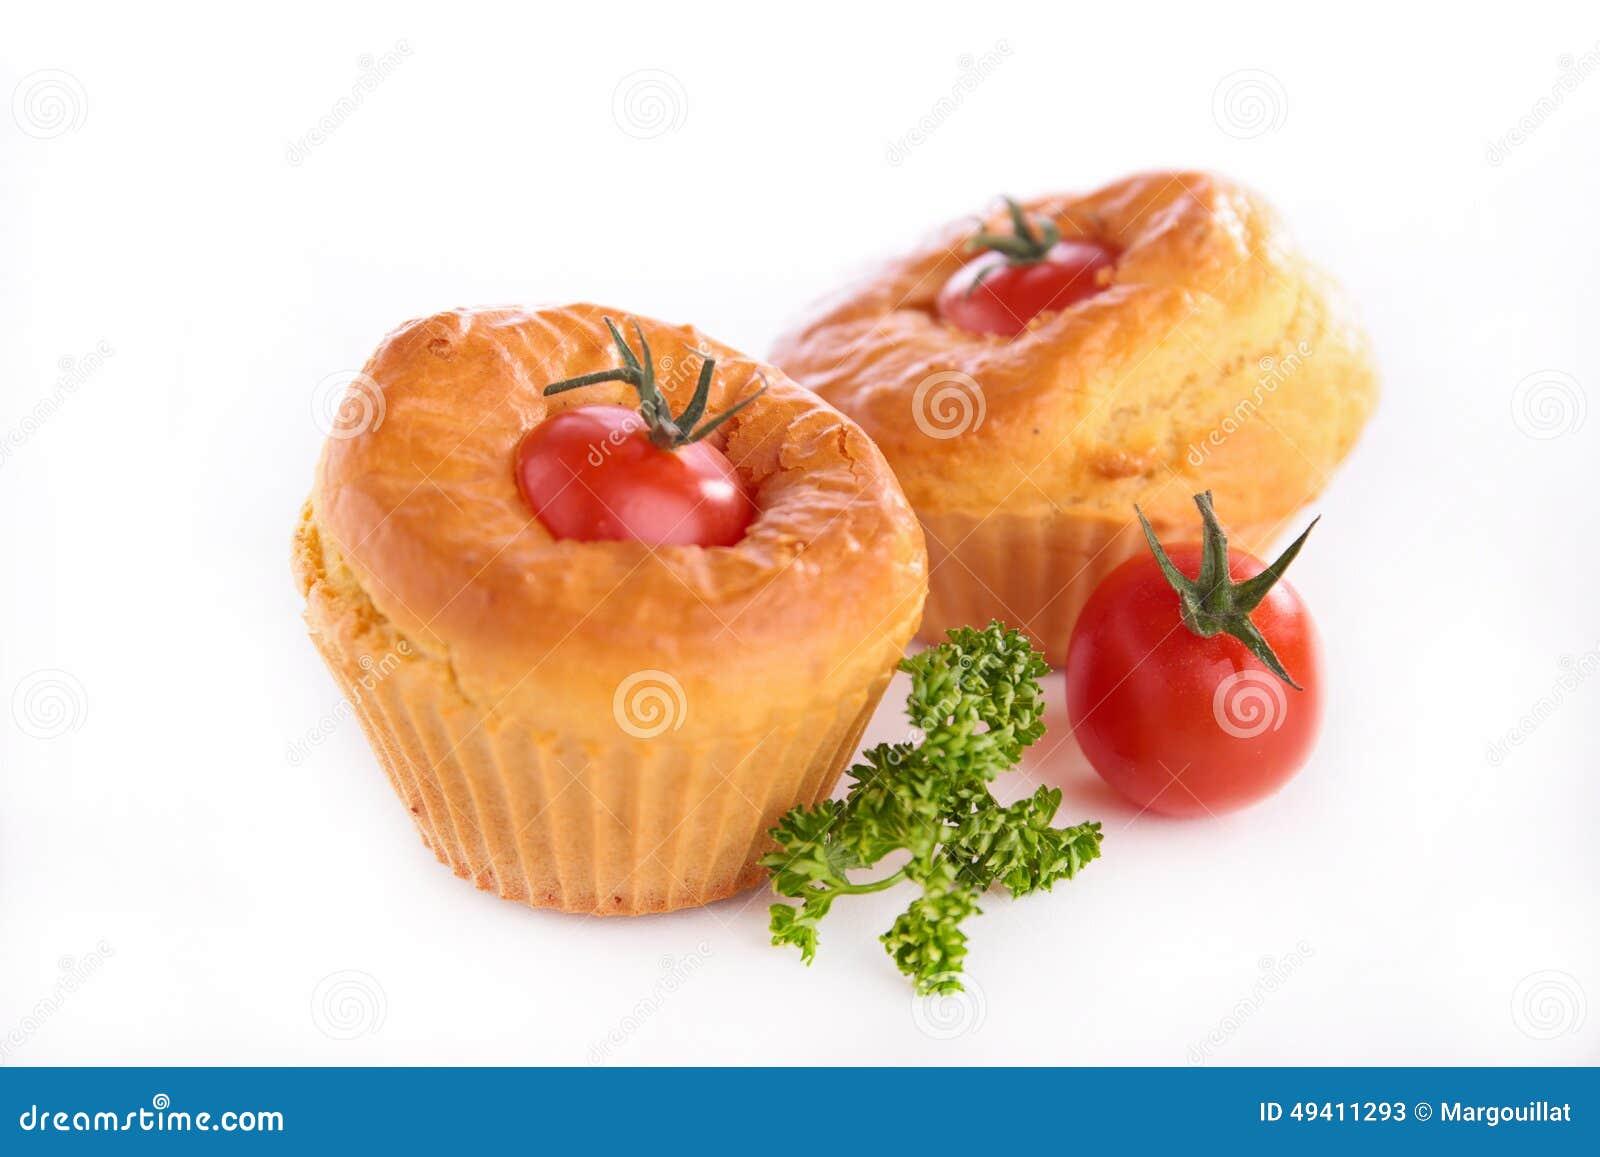 Download Tomatenmuffin stockbild. Bild von muffin, kuchen, tomate - 49411293